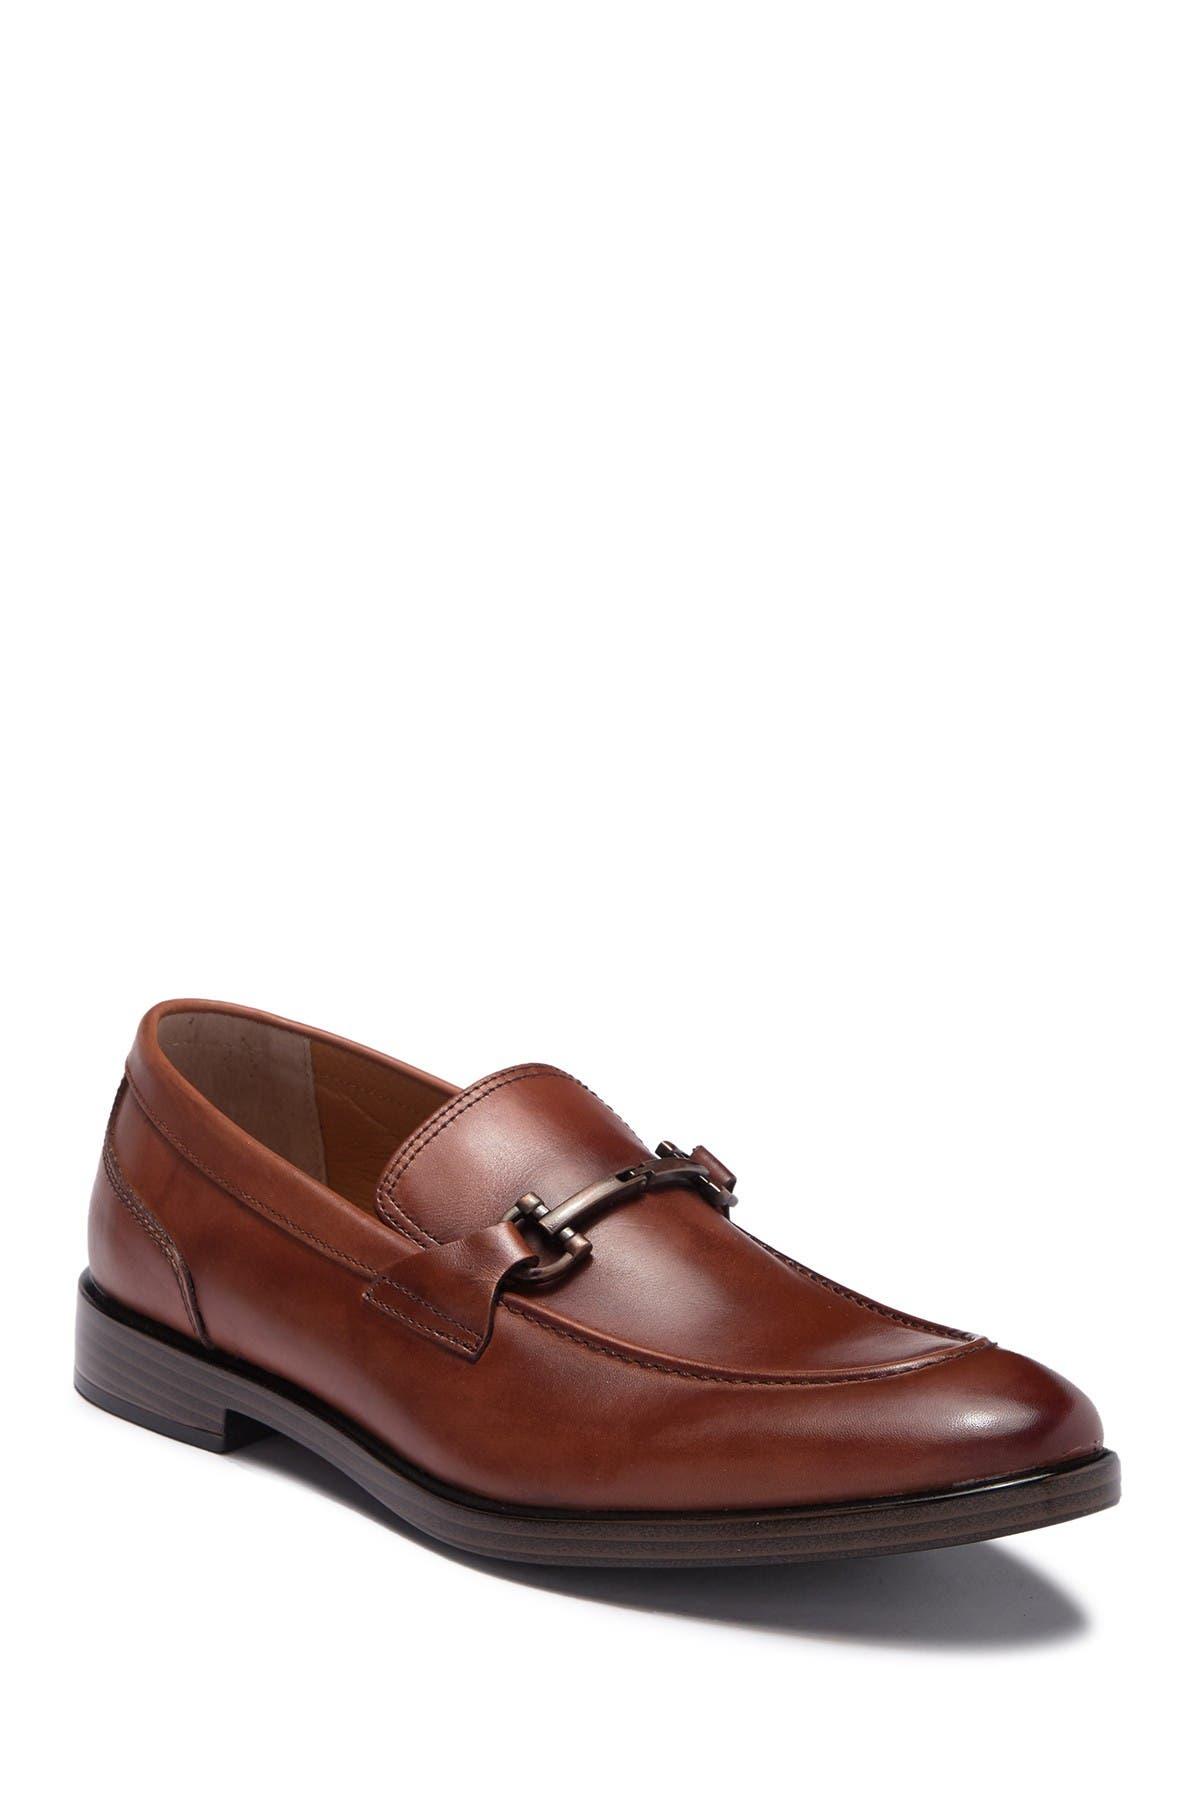 Giorgio Brutini   Bit Slip-On Loafer